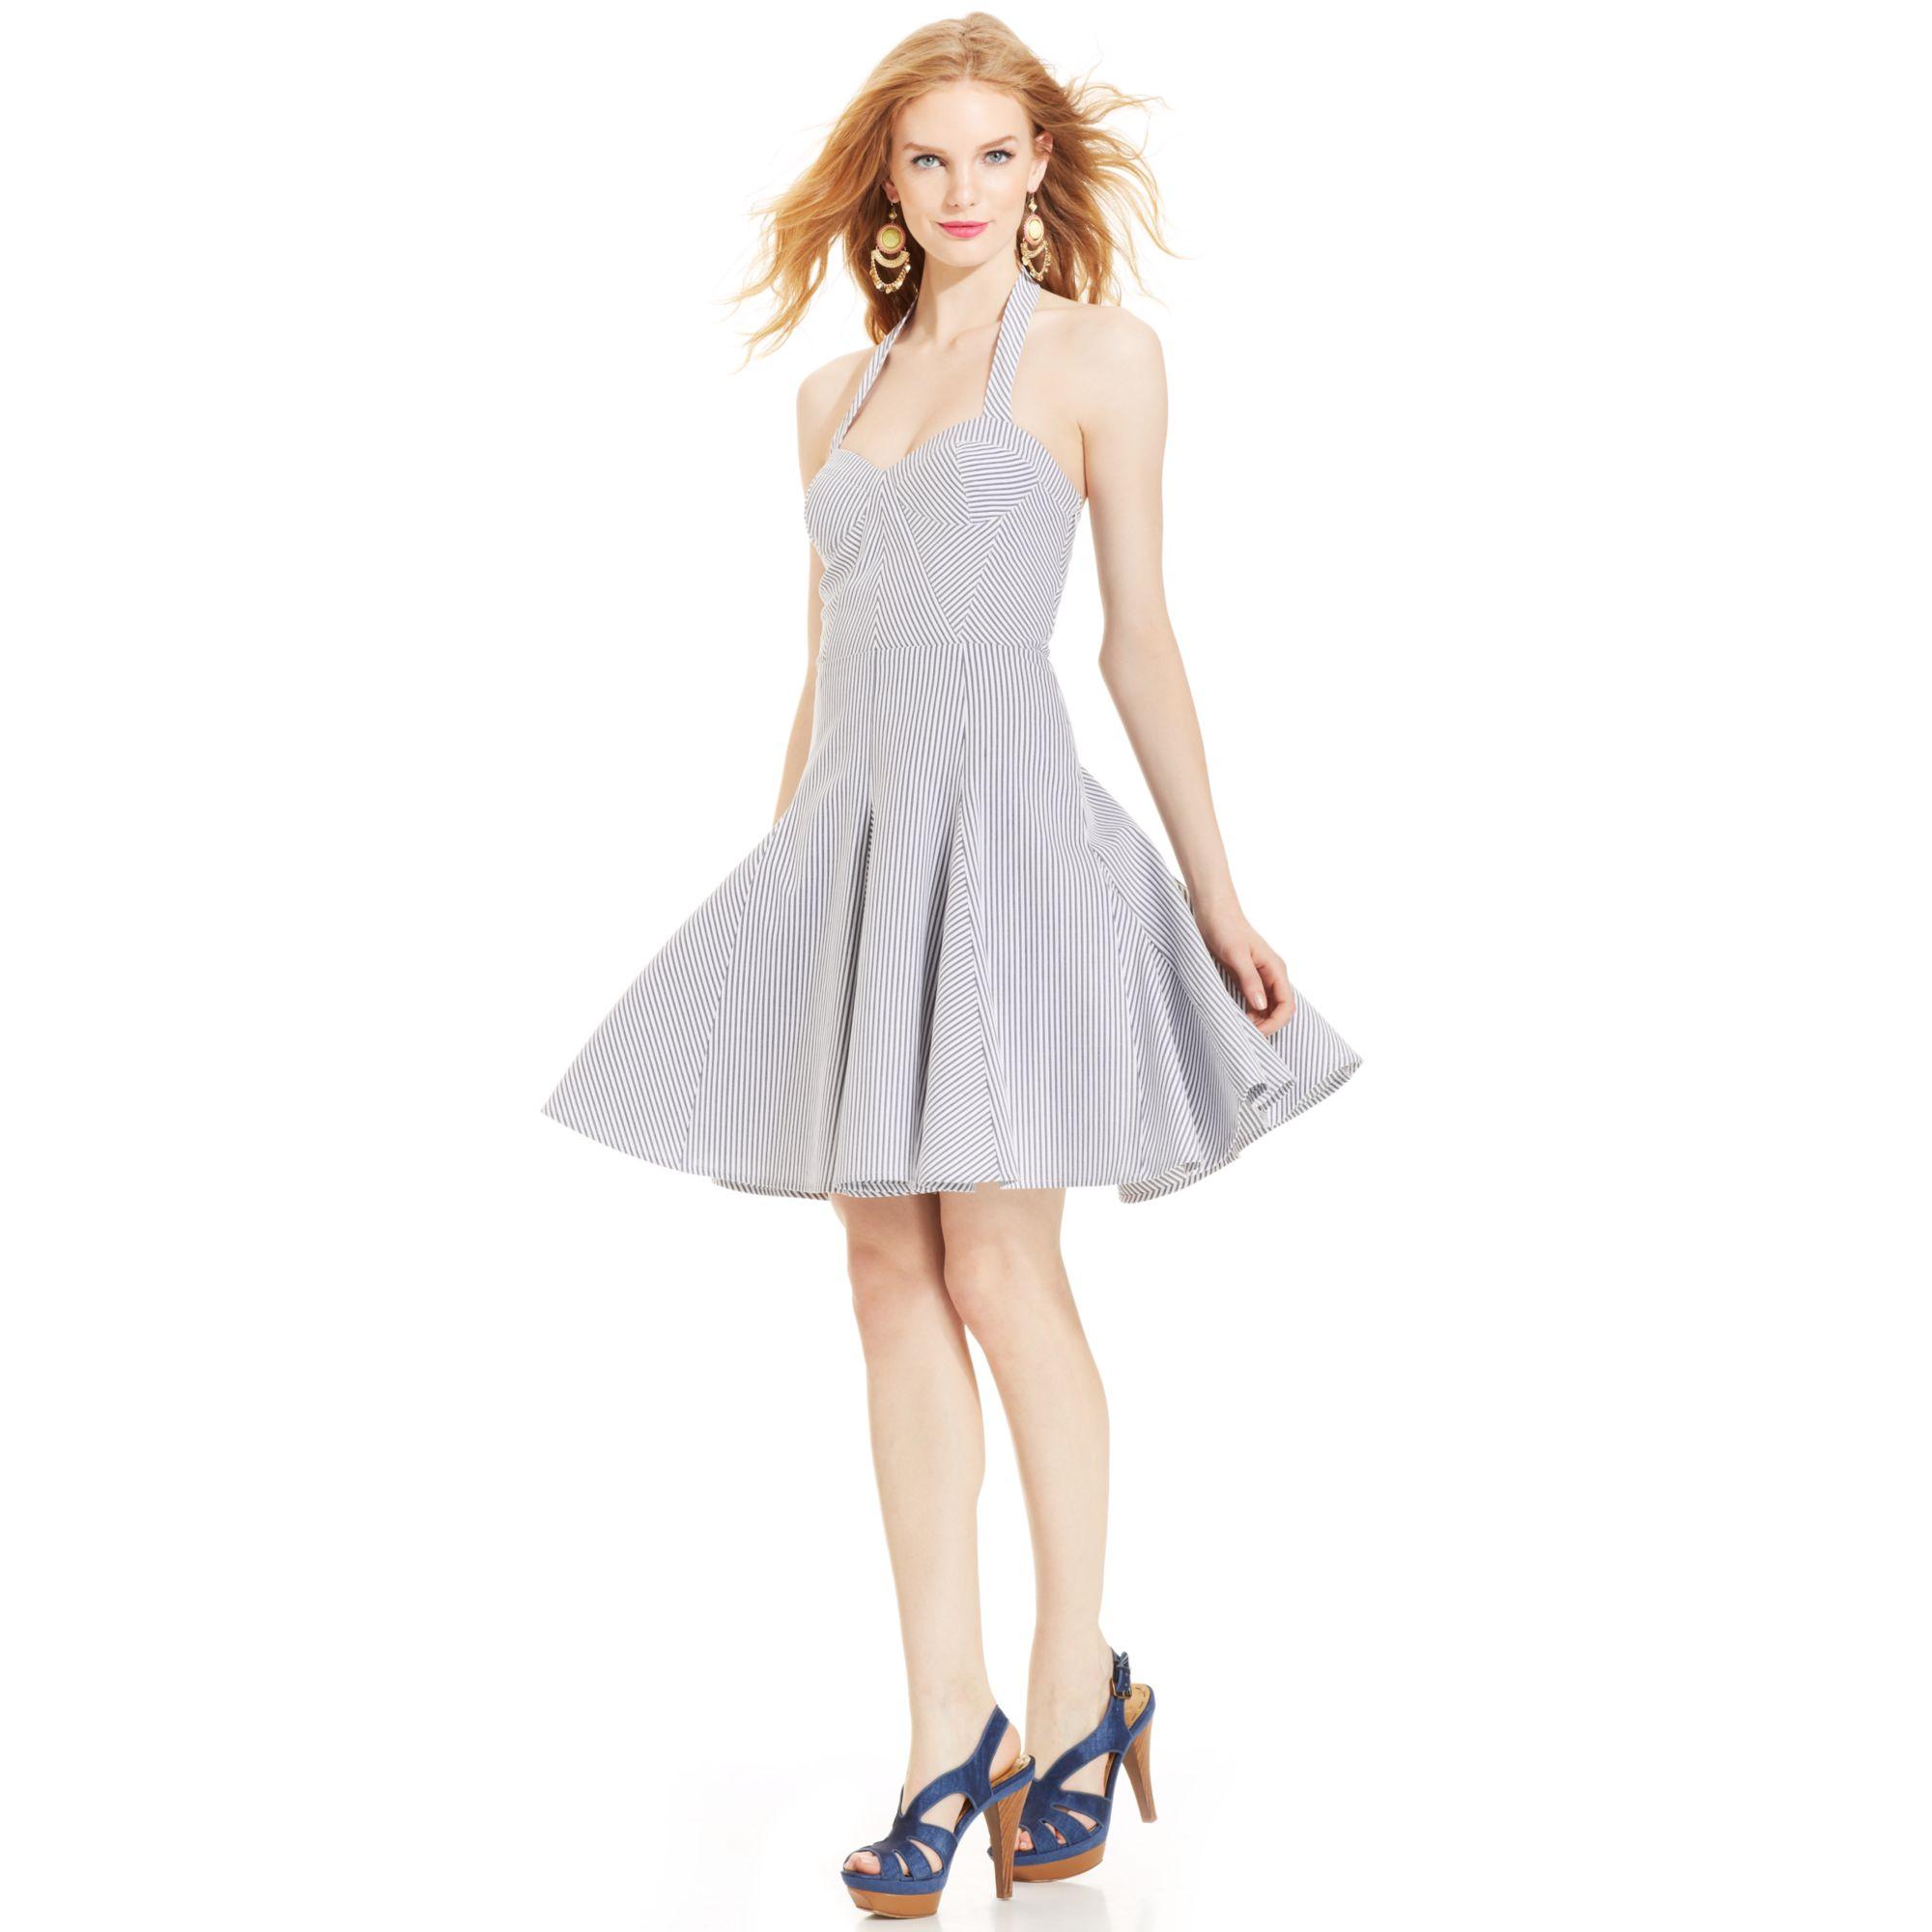 Großzügig Betsey Johnson Cocktail Dress Ideen - Brautkleider Ideen ...